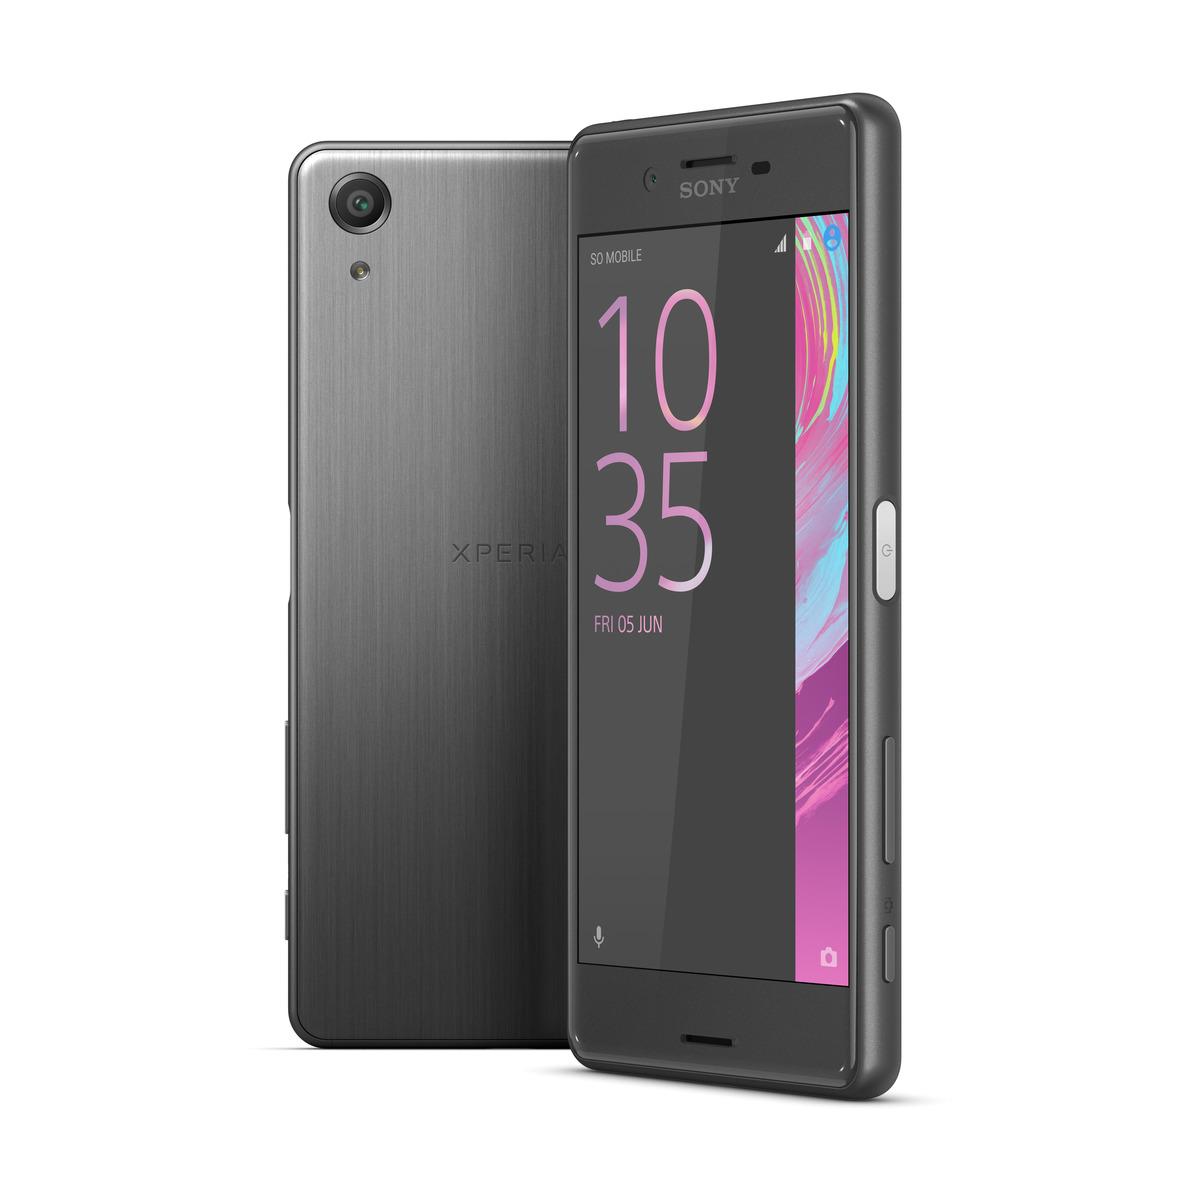 Sony Xperia X Performance smarttelefon (sort) Mobiltelefon